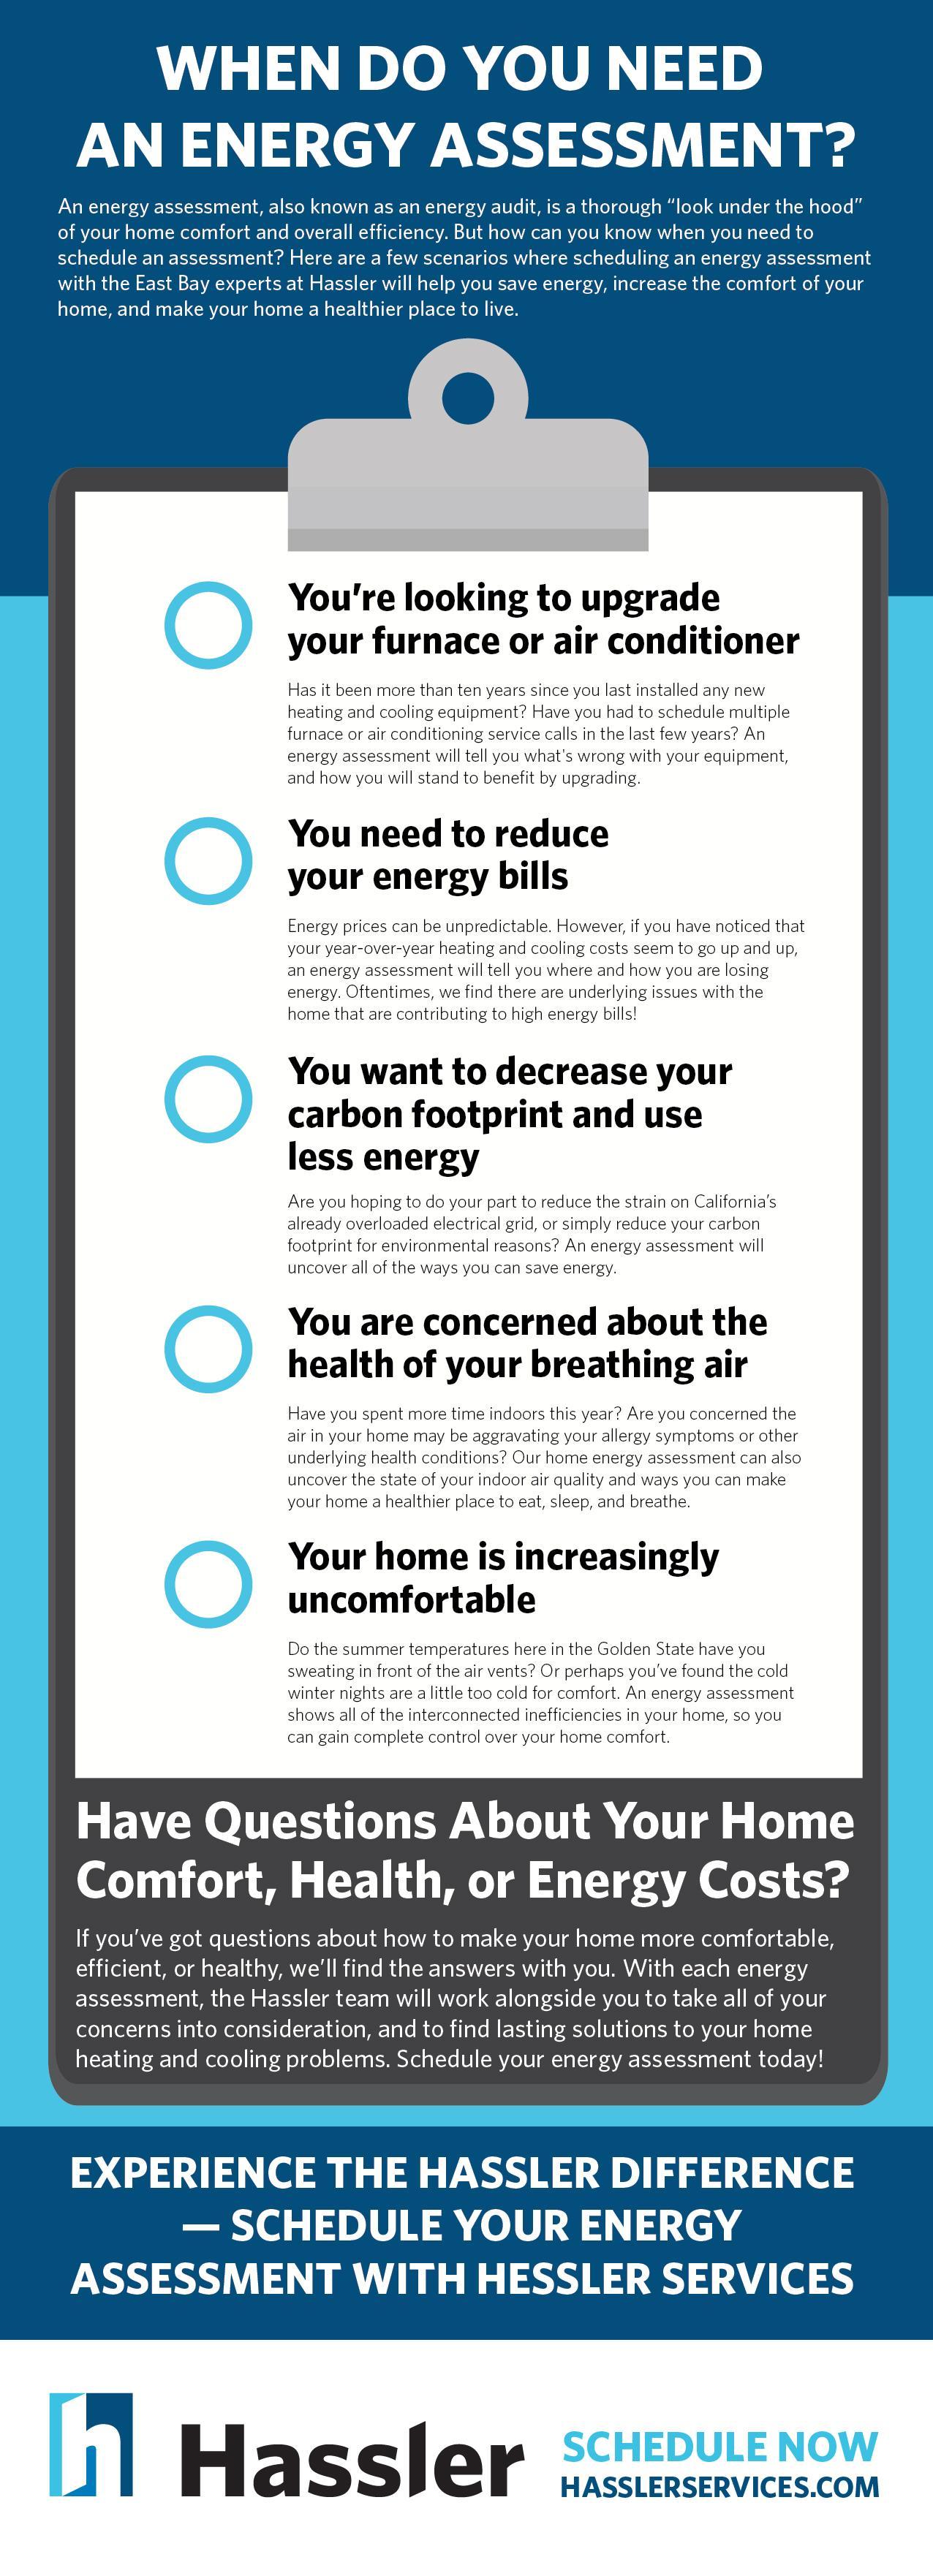 hassler energy assessment infographic